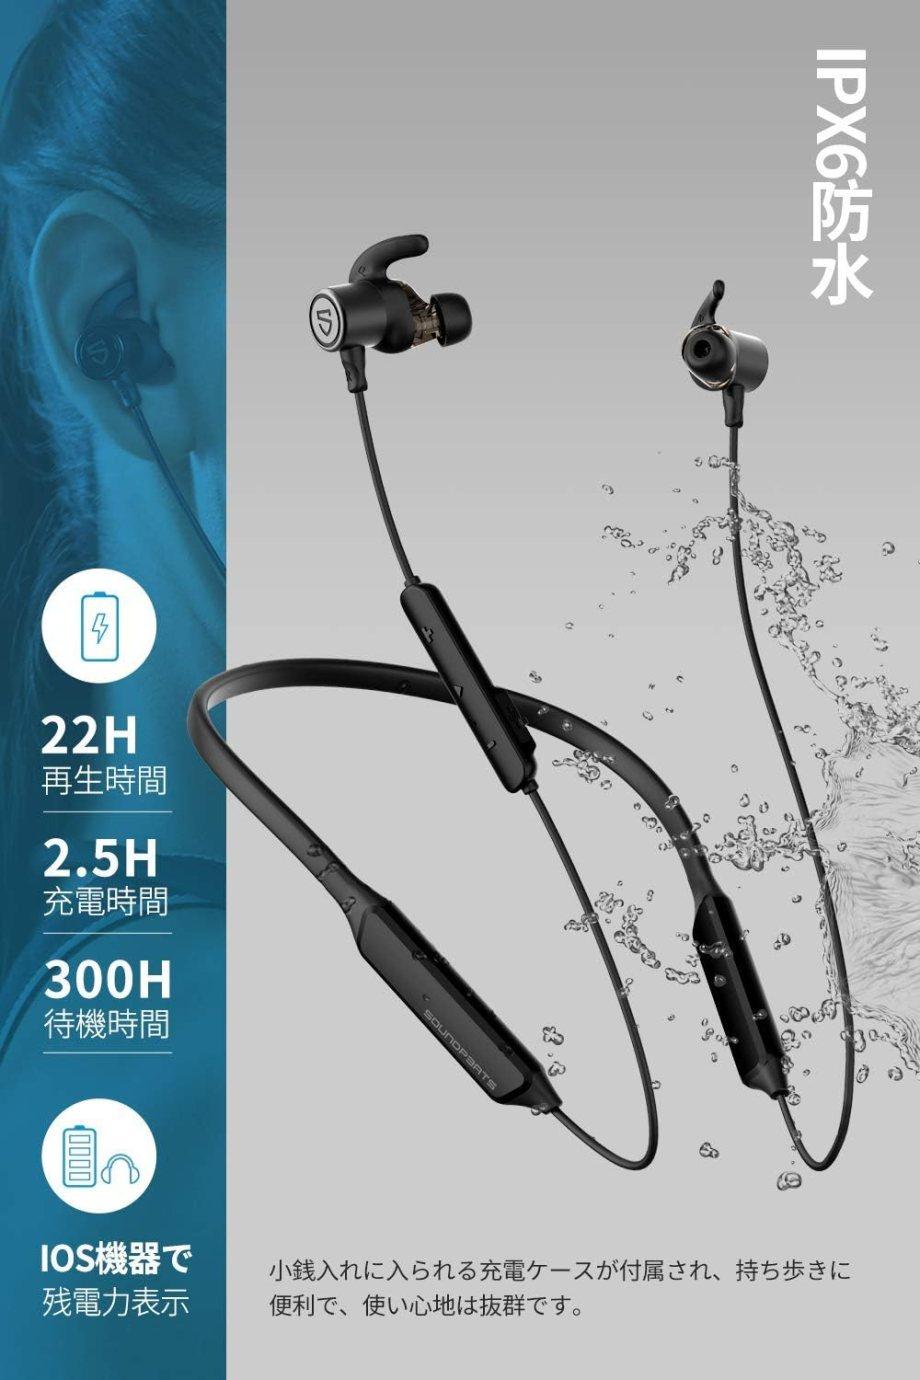 SoundPeats Force Pro